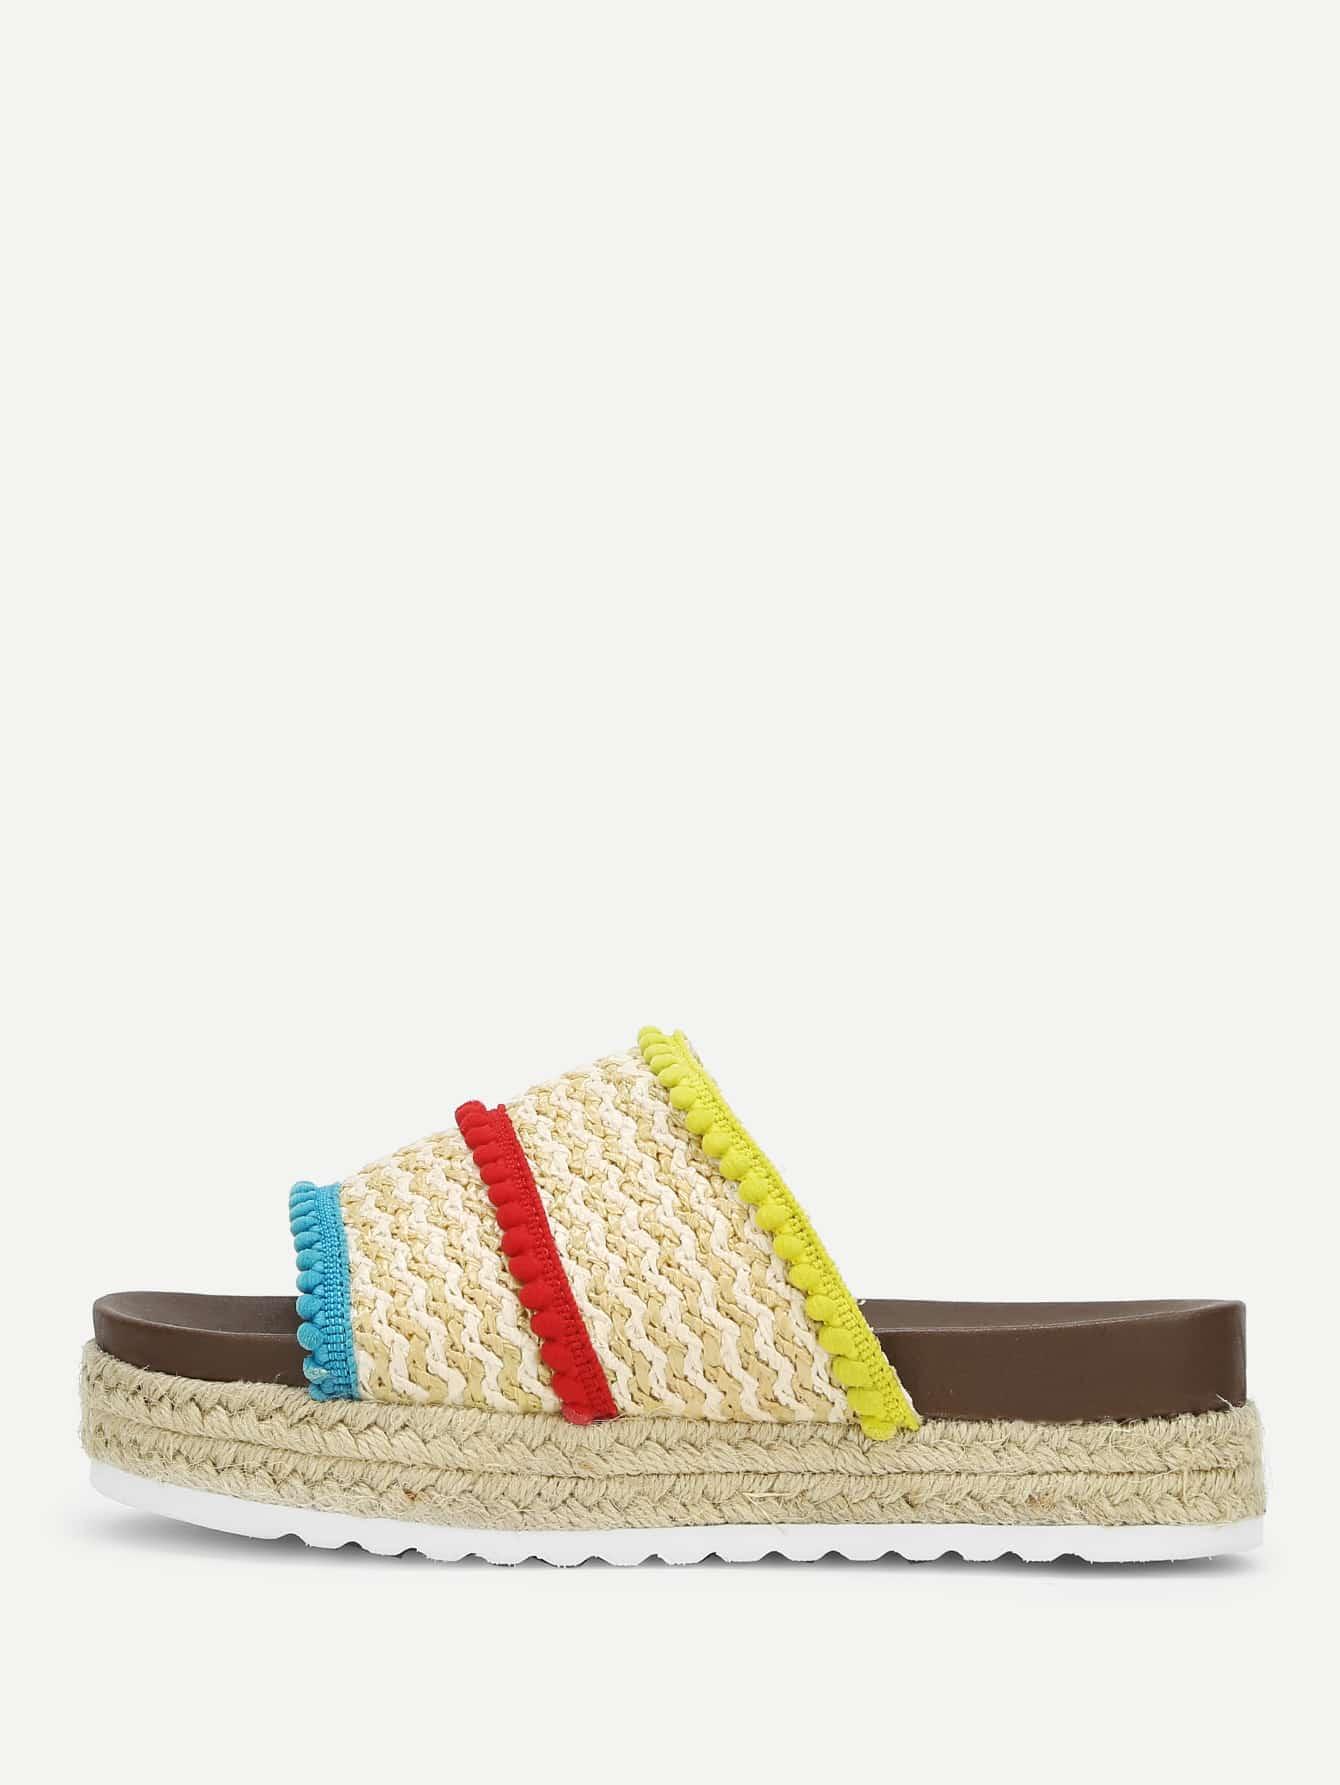 Peep Toe Flatform Sandals банка для хранения tima банка для сыпучих продуктов тима 1000мл стекло